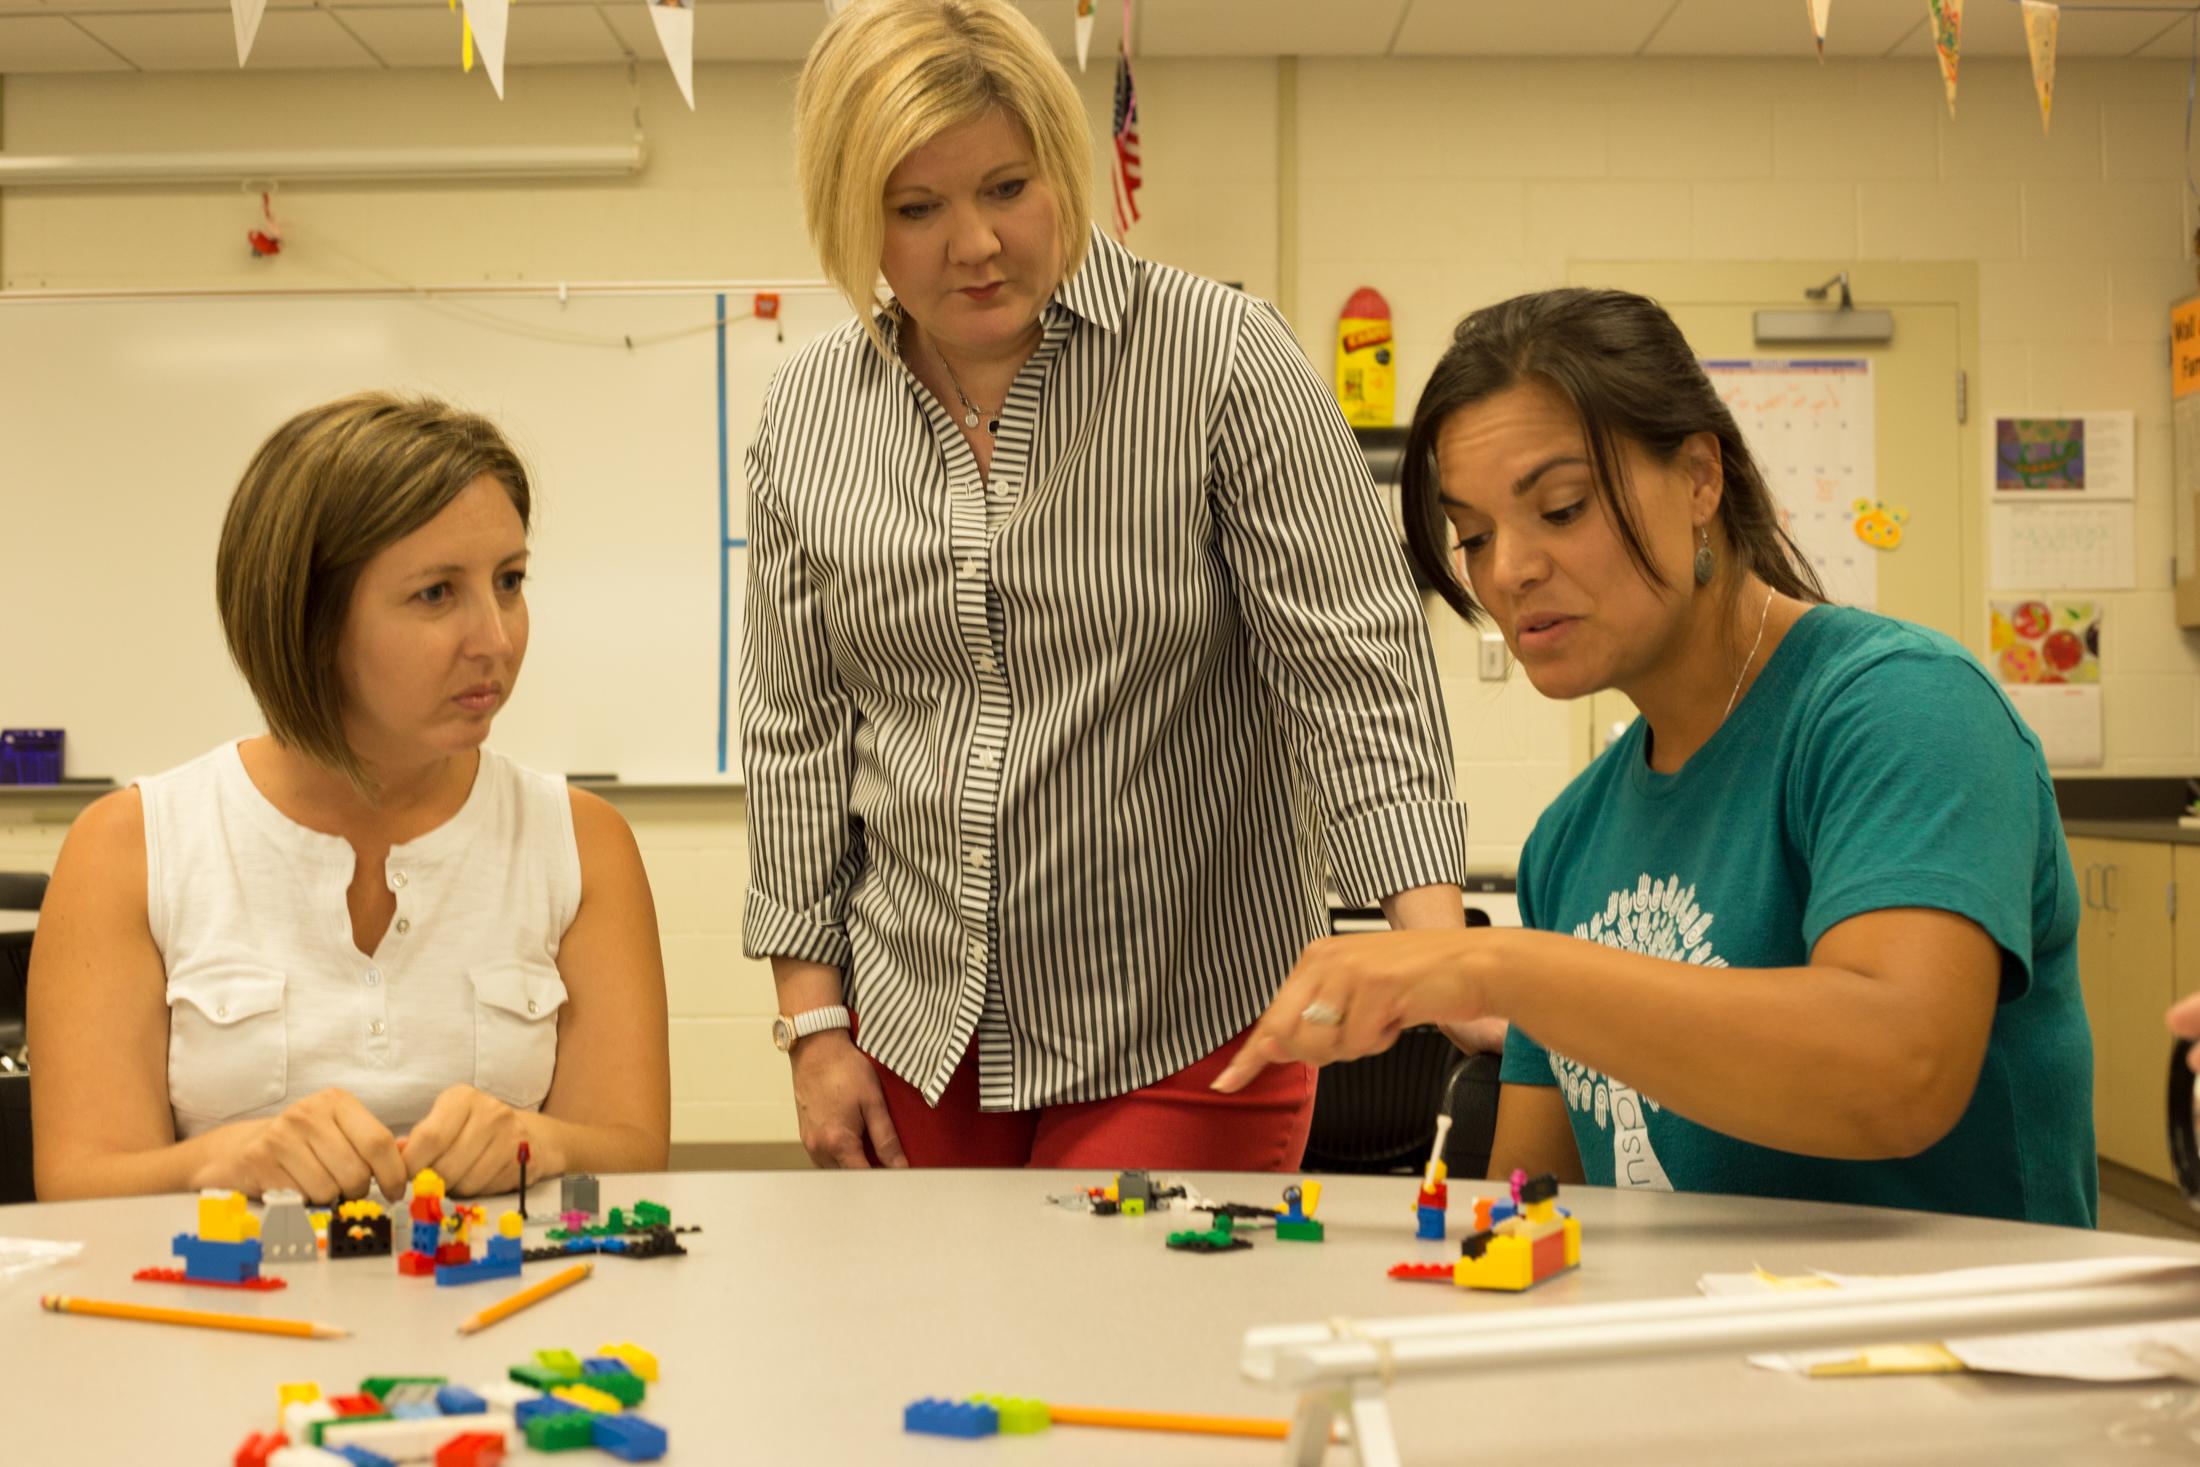 Kim Polson, Certified LEGO® SERIOUS PLAY® Facilitator